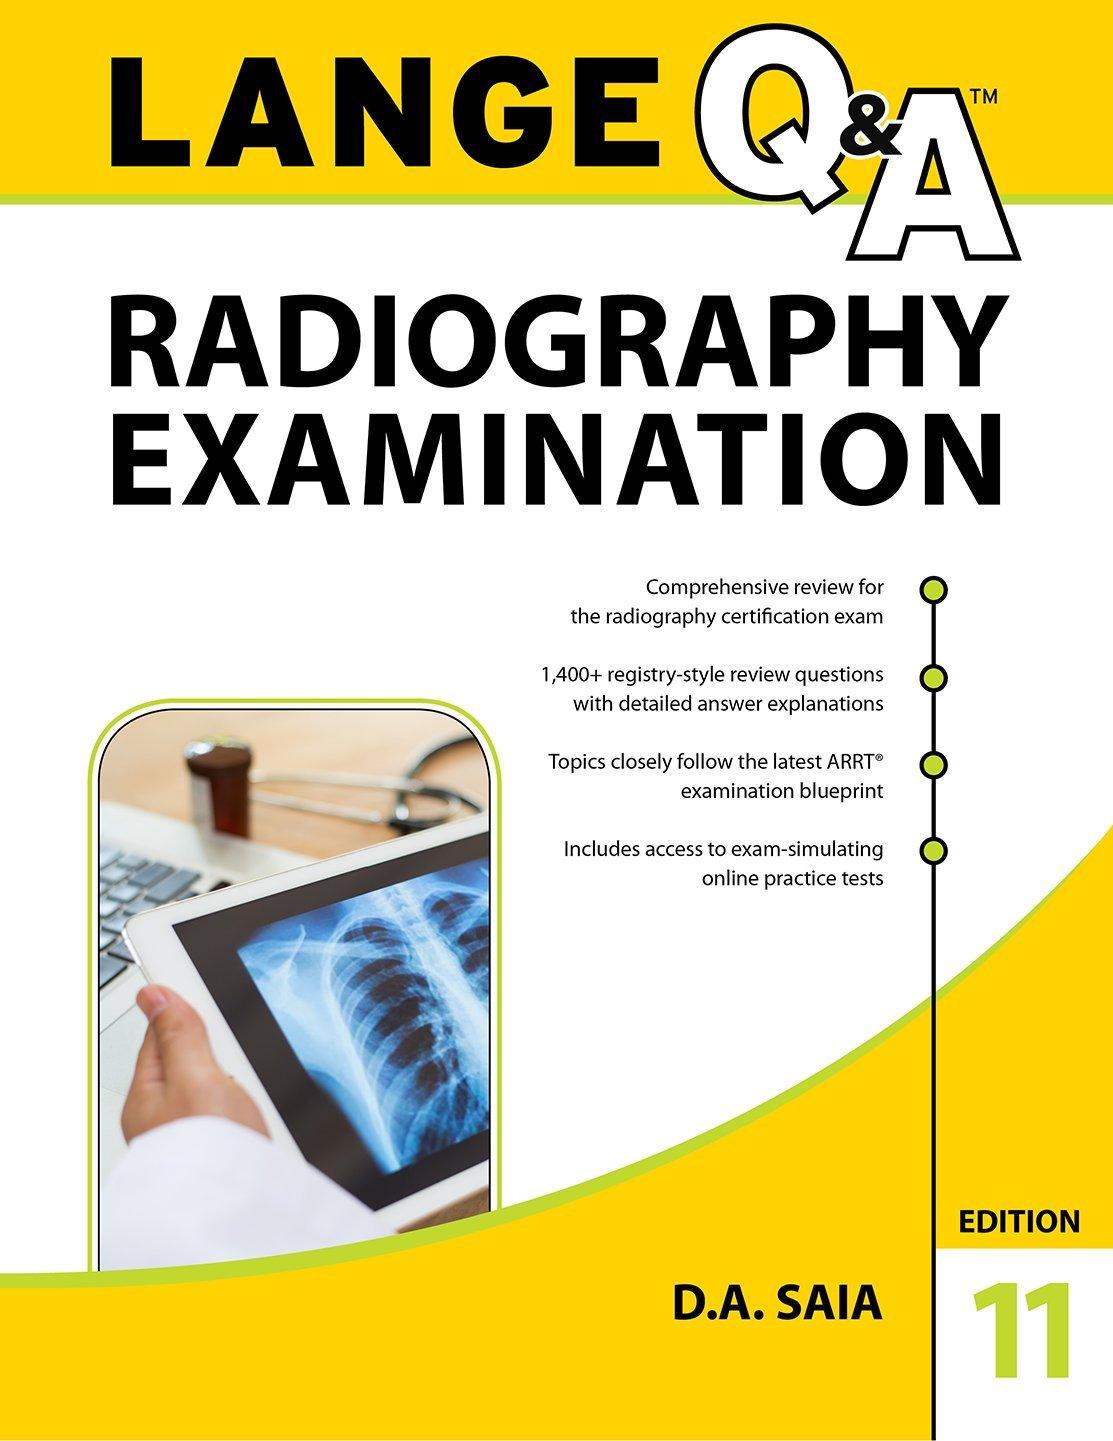 Lange Qa Radiography Examination 11th Edition Da Saia